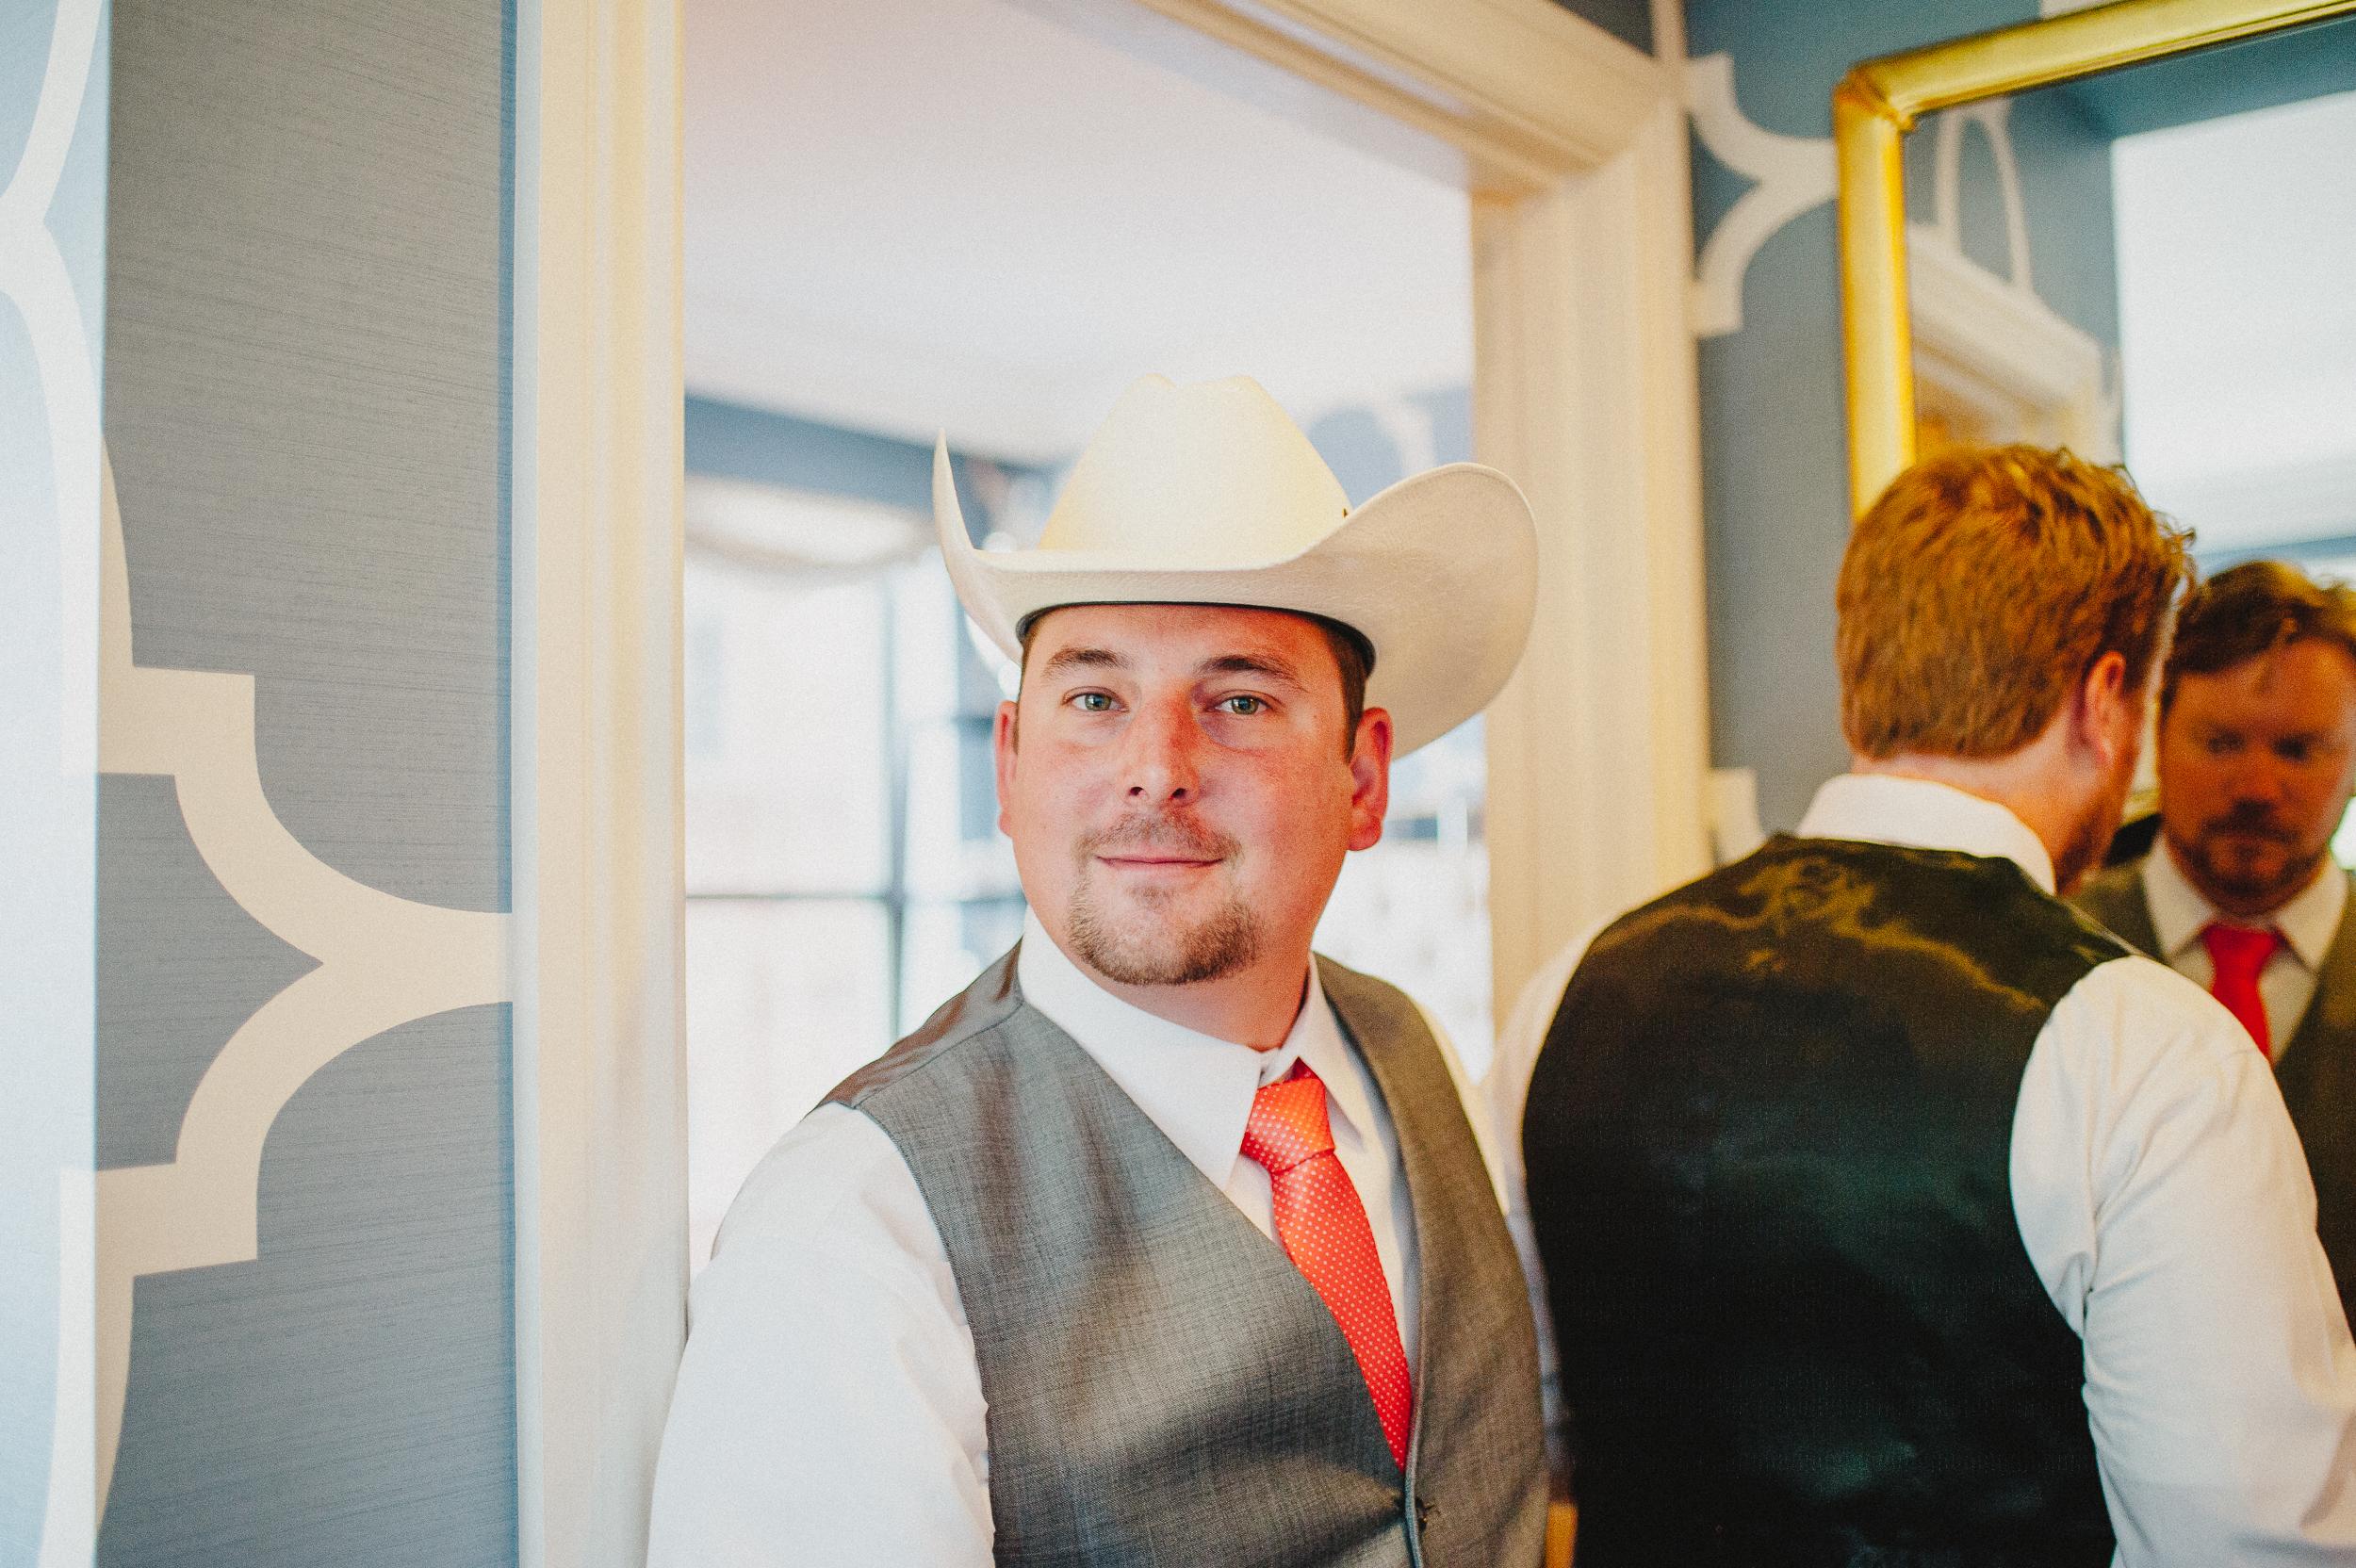 union-trust-philadelphia-wedding-photographer-8.jpg